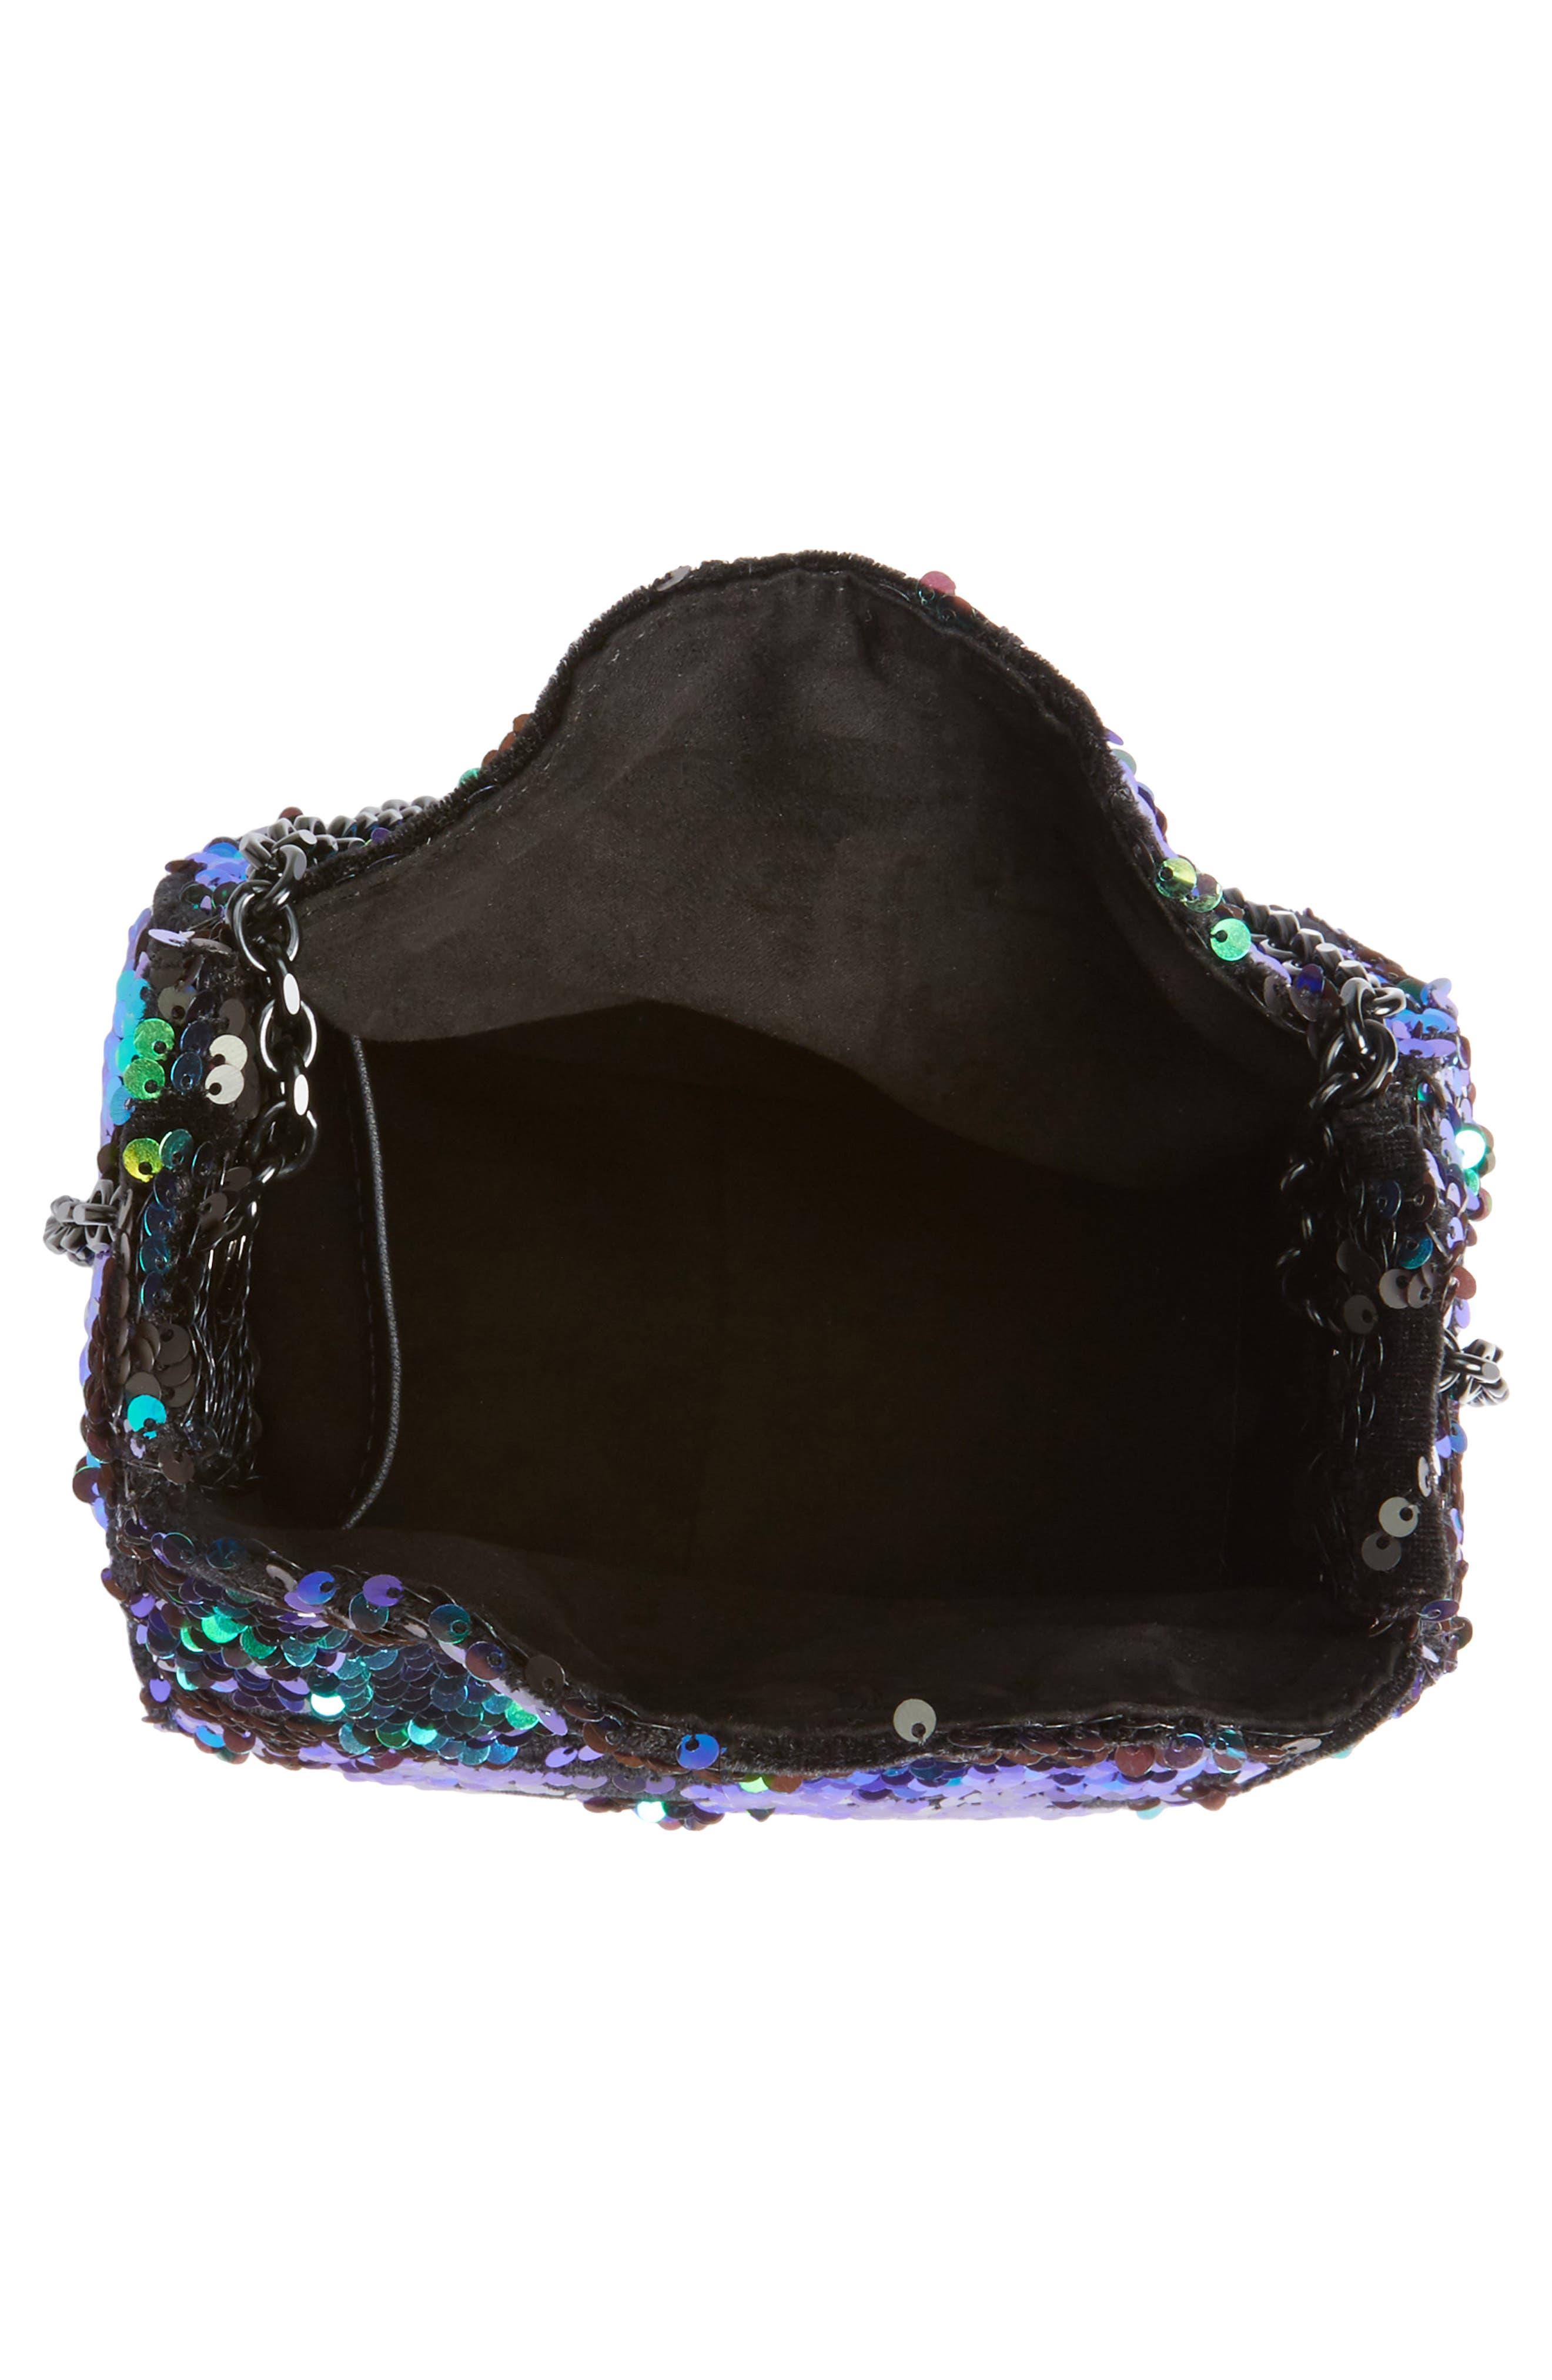 Amy Sequin Bucket Bag,                             Alternate thumbnail 4, color,                             Iridescent Sequins